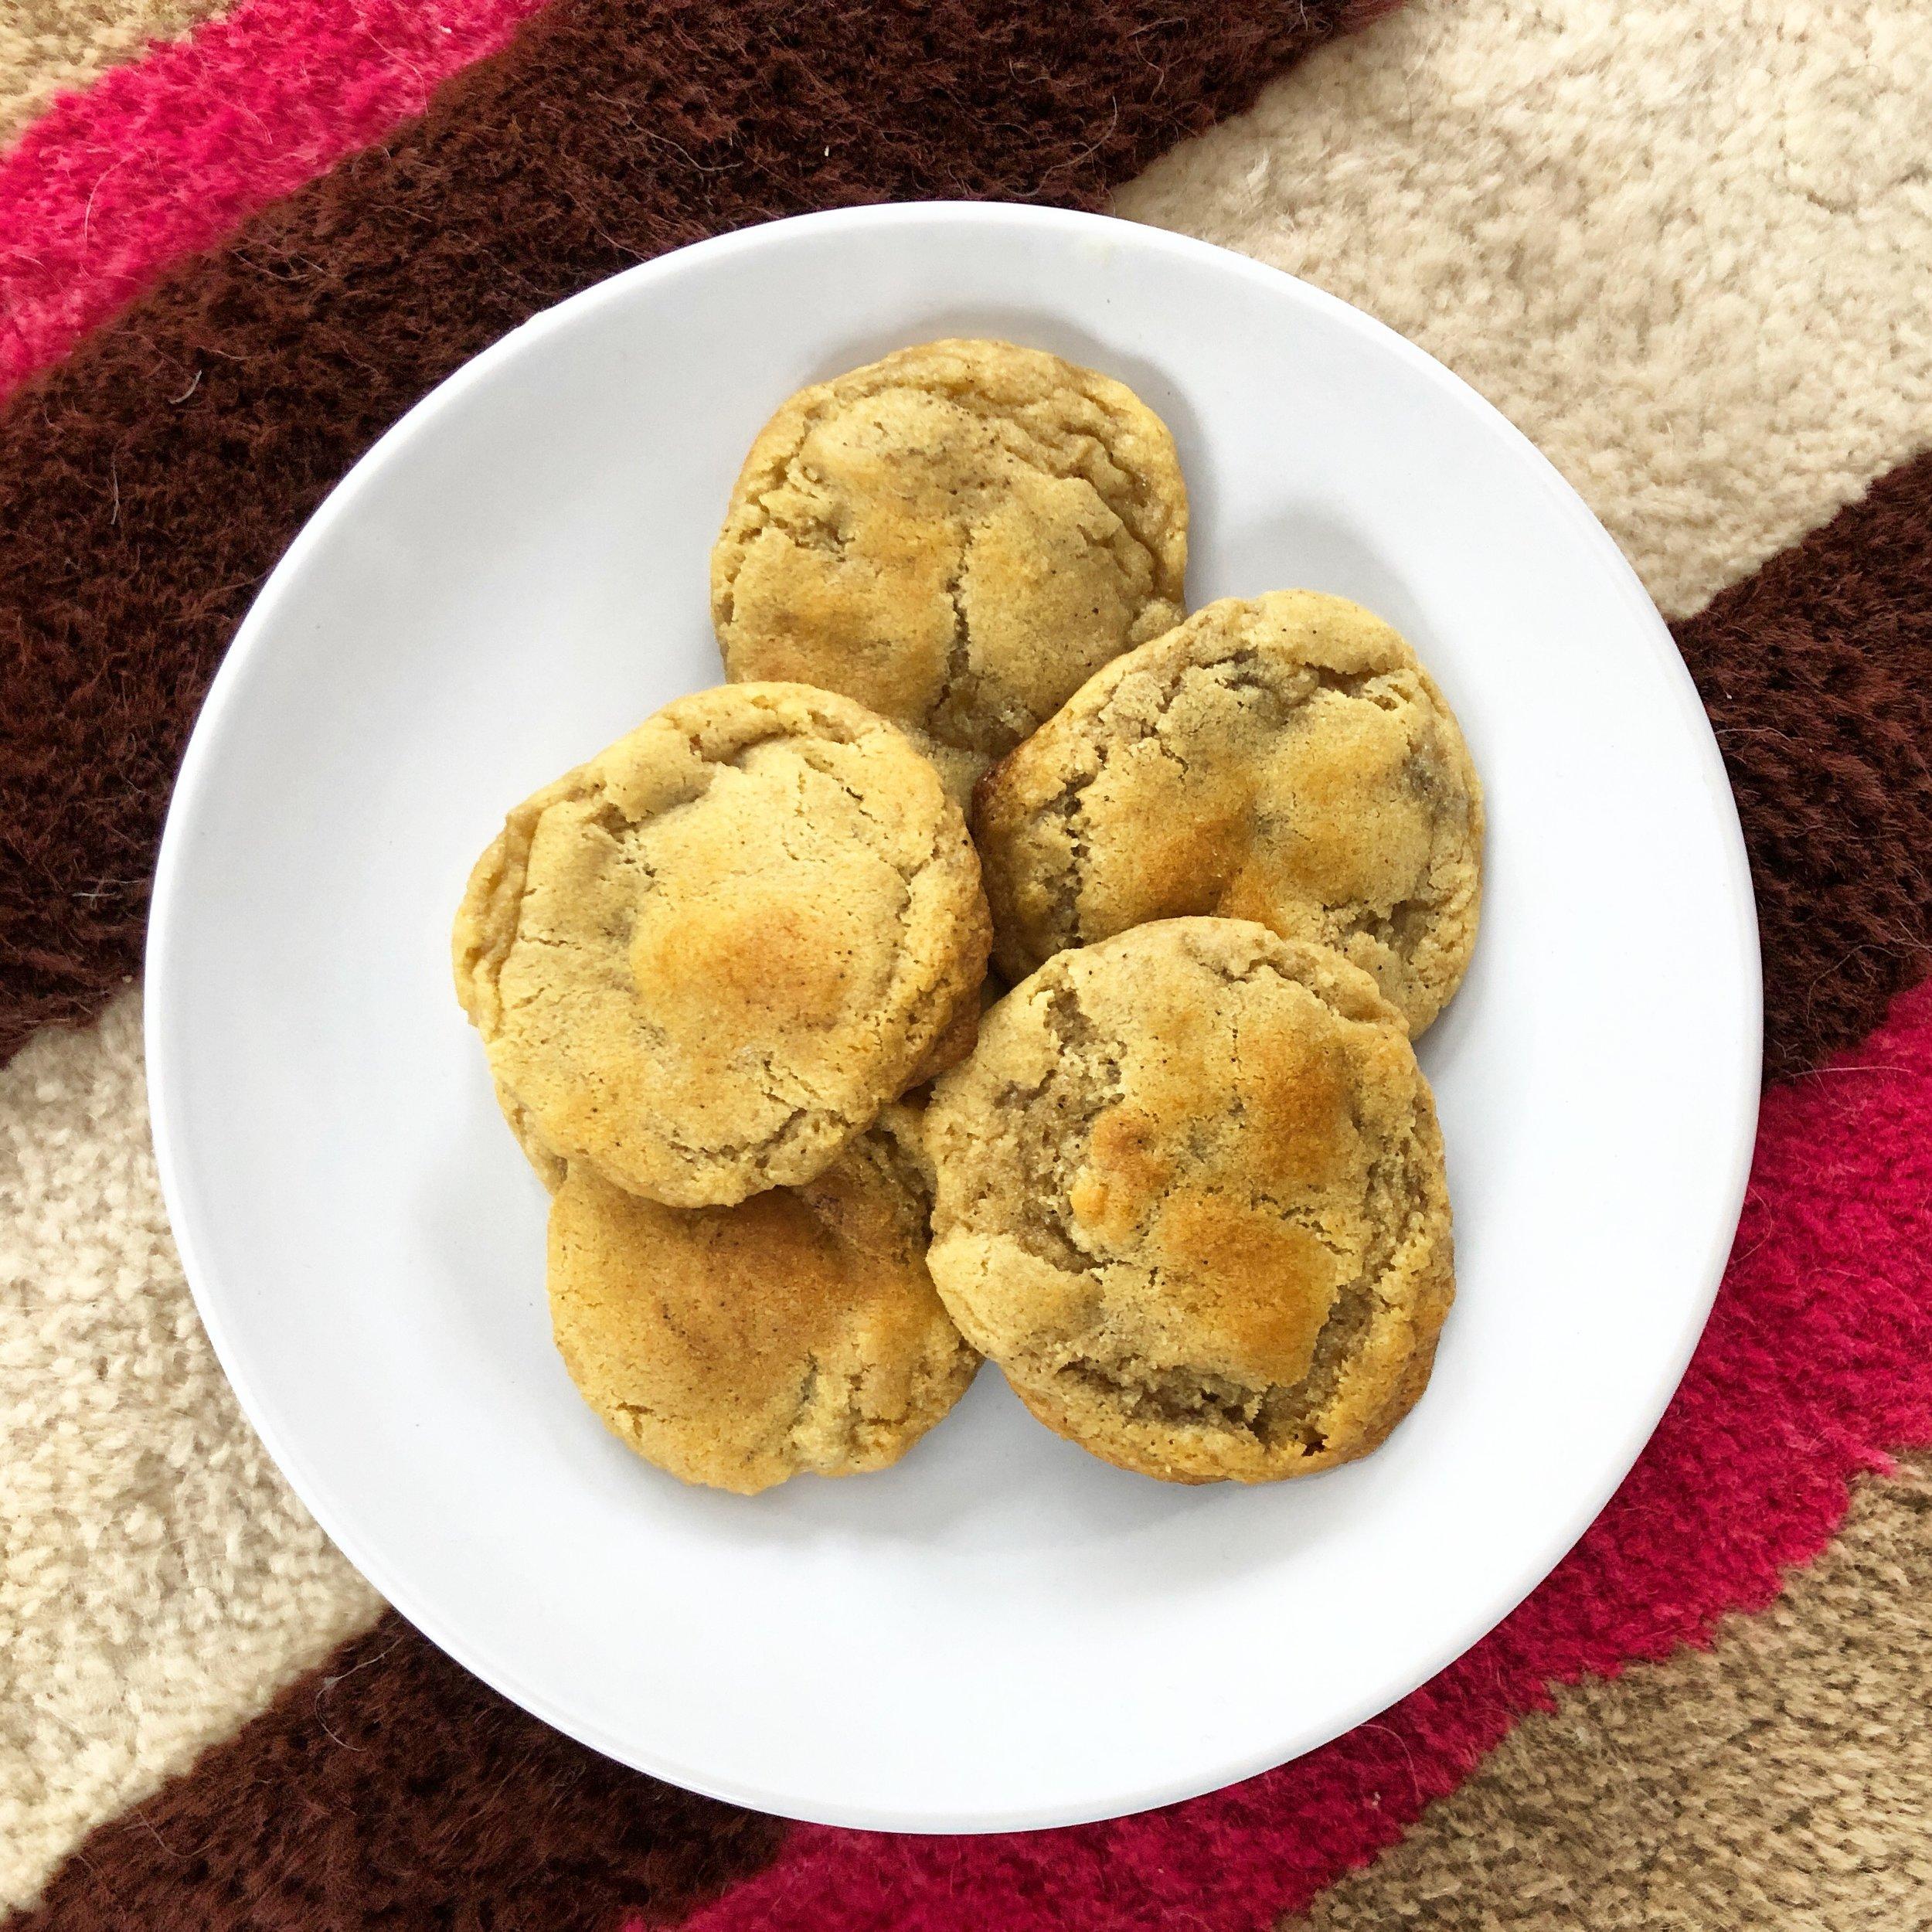 Warm sea-salt-espresso-chocolate-chip cookies upon arrival!